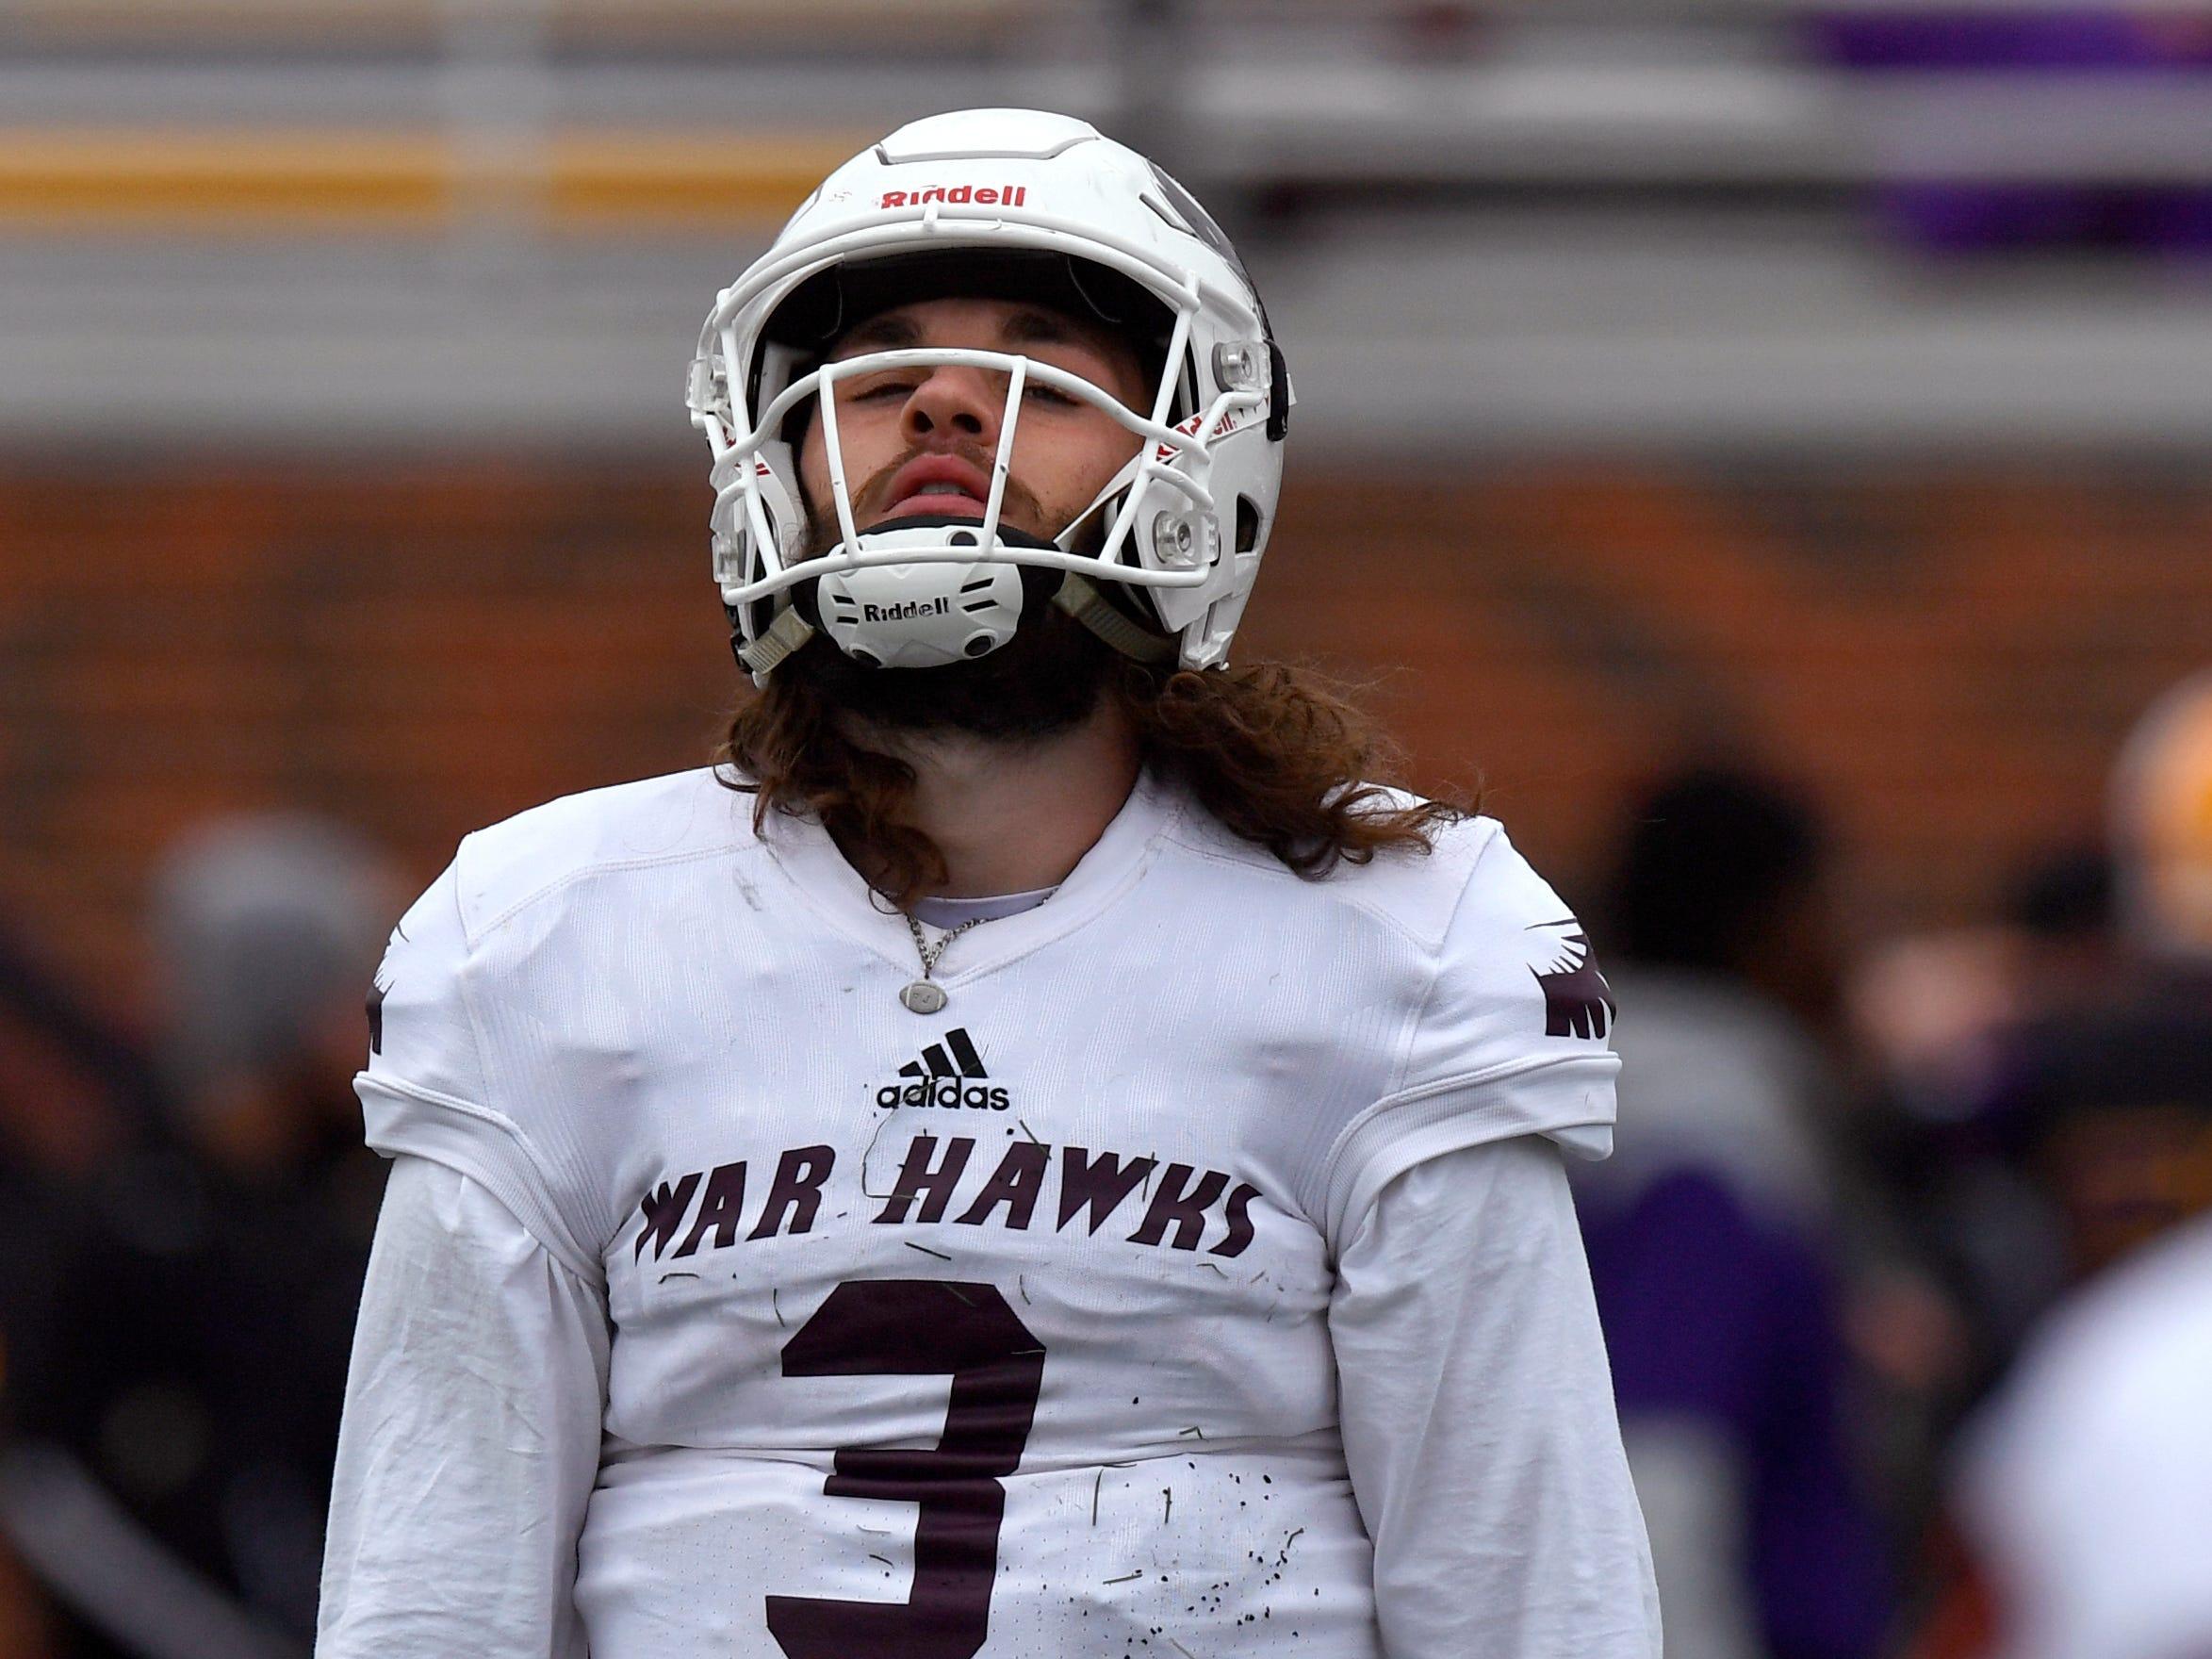 War Hawks quarterback Kevin Hurley, jr. expresses his frustration as McMurry University came up short against the Cowboys defense Saturday Nov. 10, 2018. Final score was 83-6, Hardin-Simmons University.